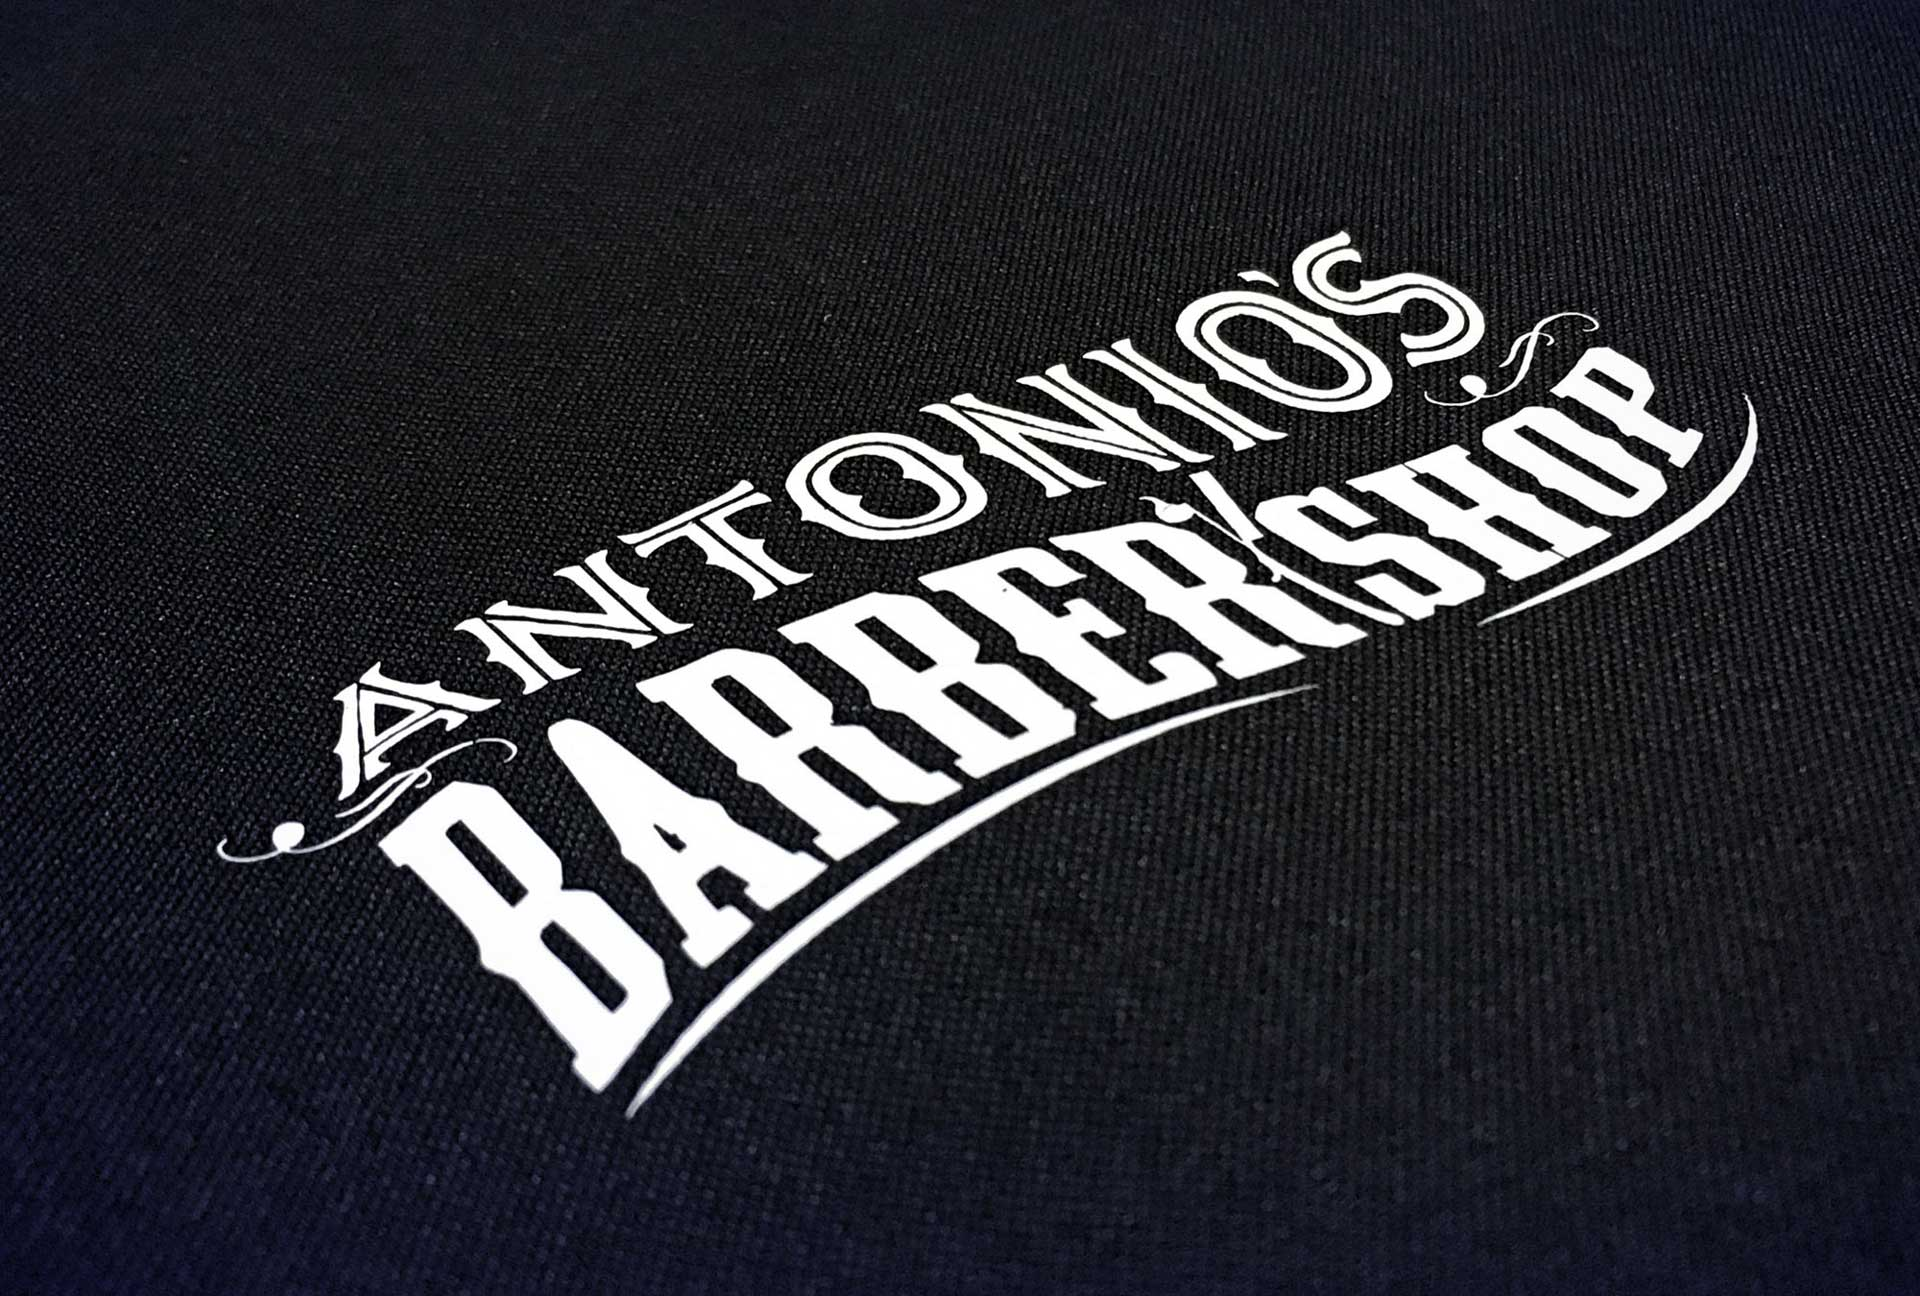 Uniform & Kits - Antonio's Barber Shop